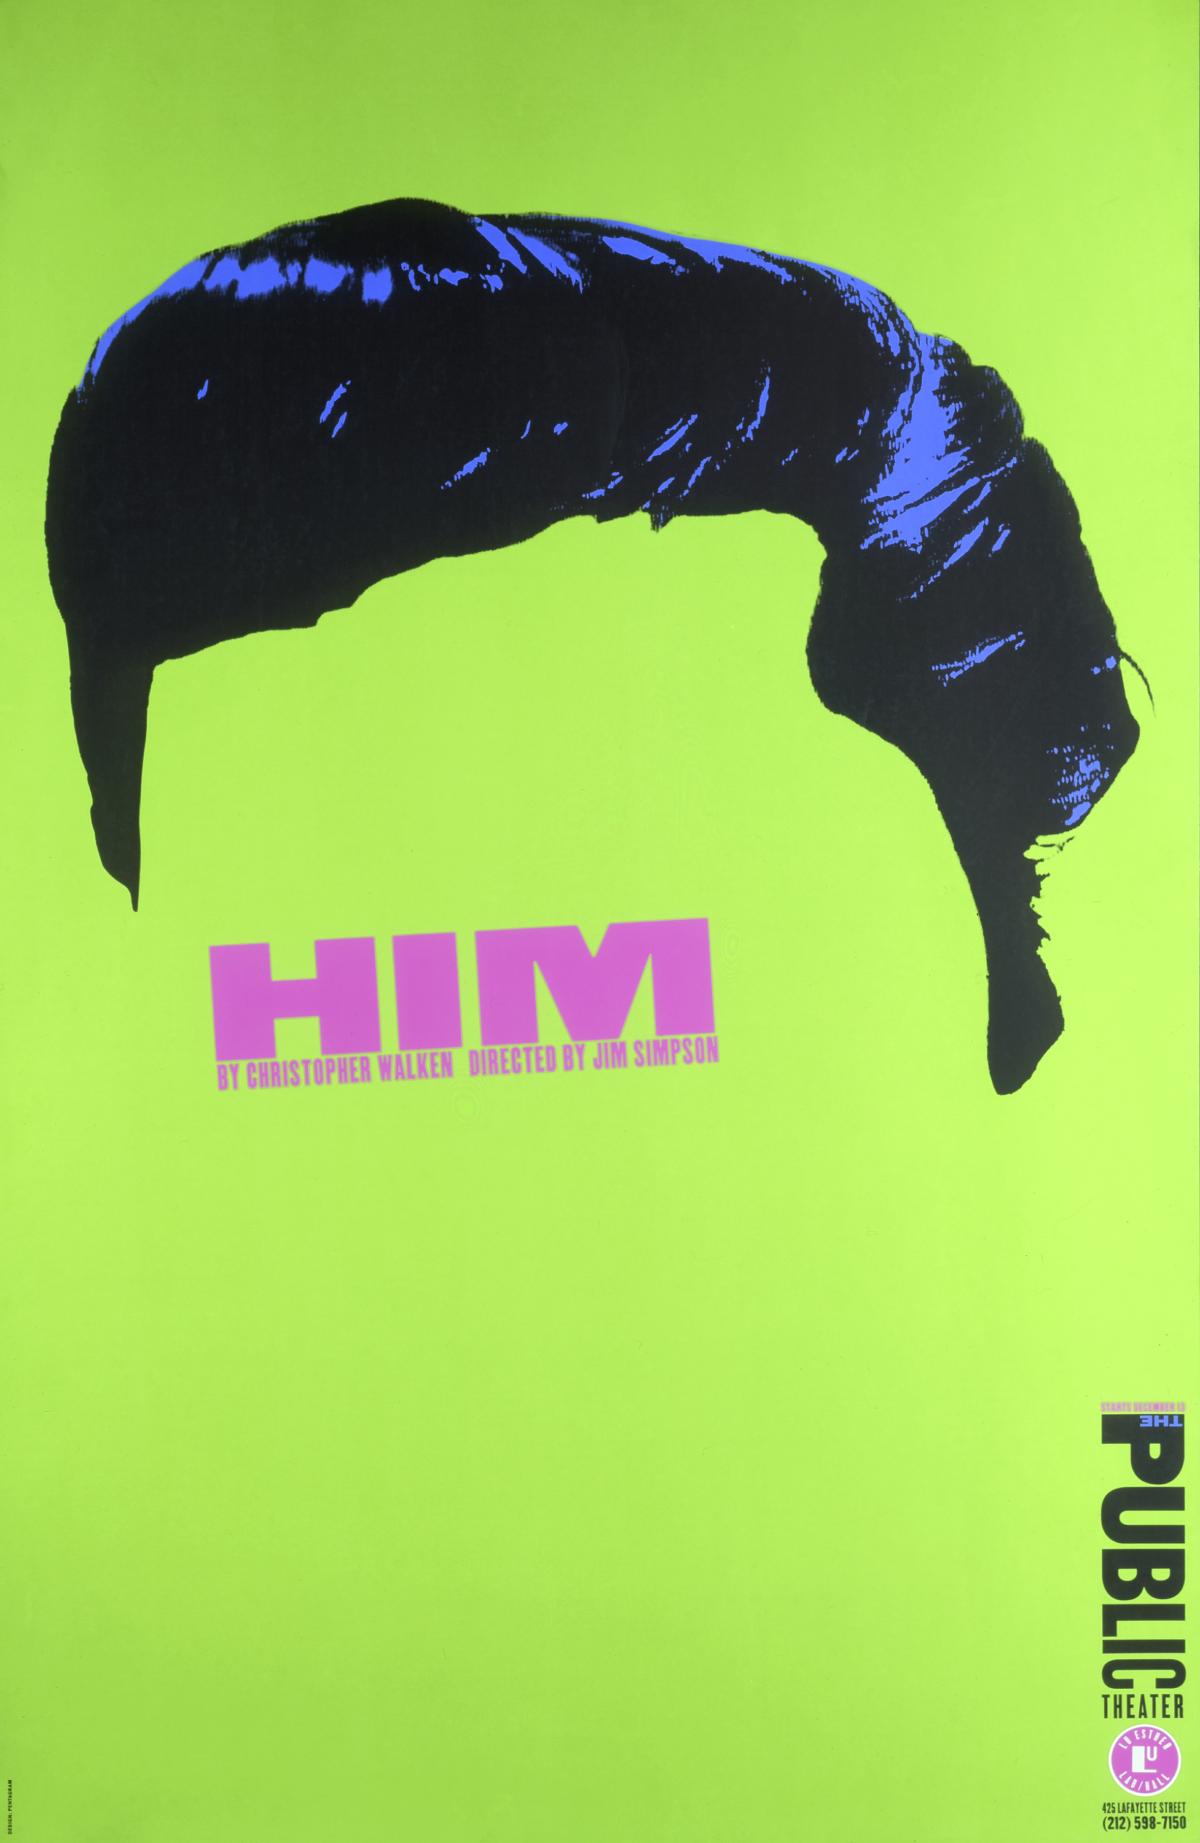 2. Him